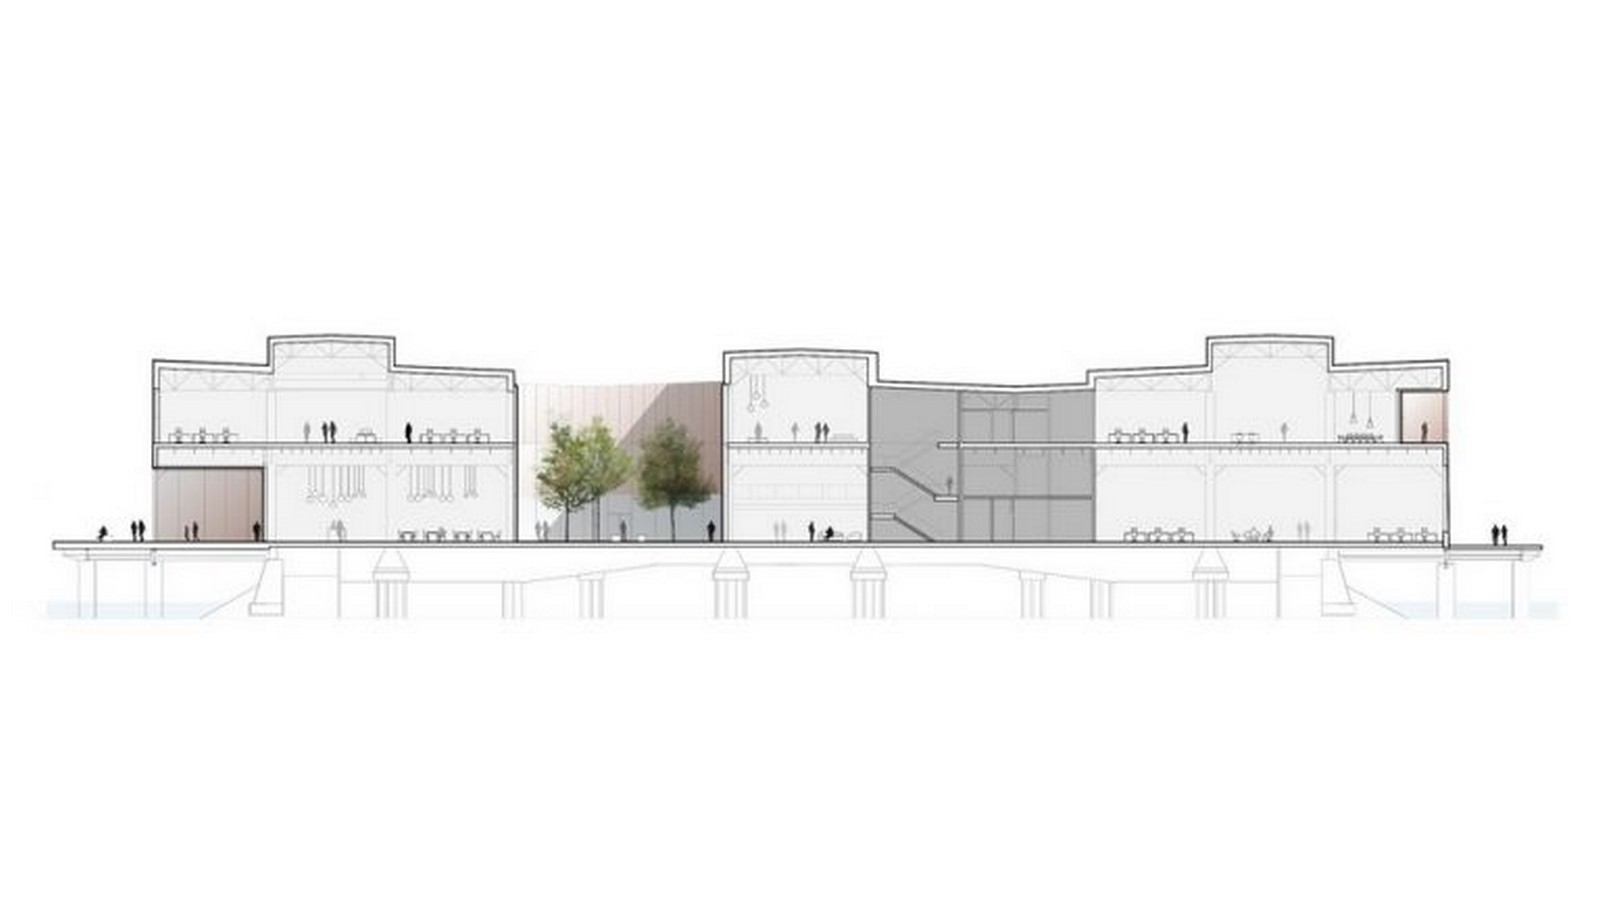 Construction begins at Boston's Commonwealth Pier designed by Schmidt Hammer Lassen Architects - Sheet4